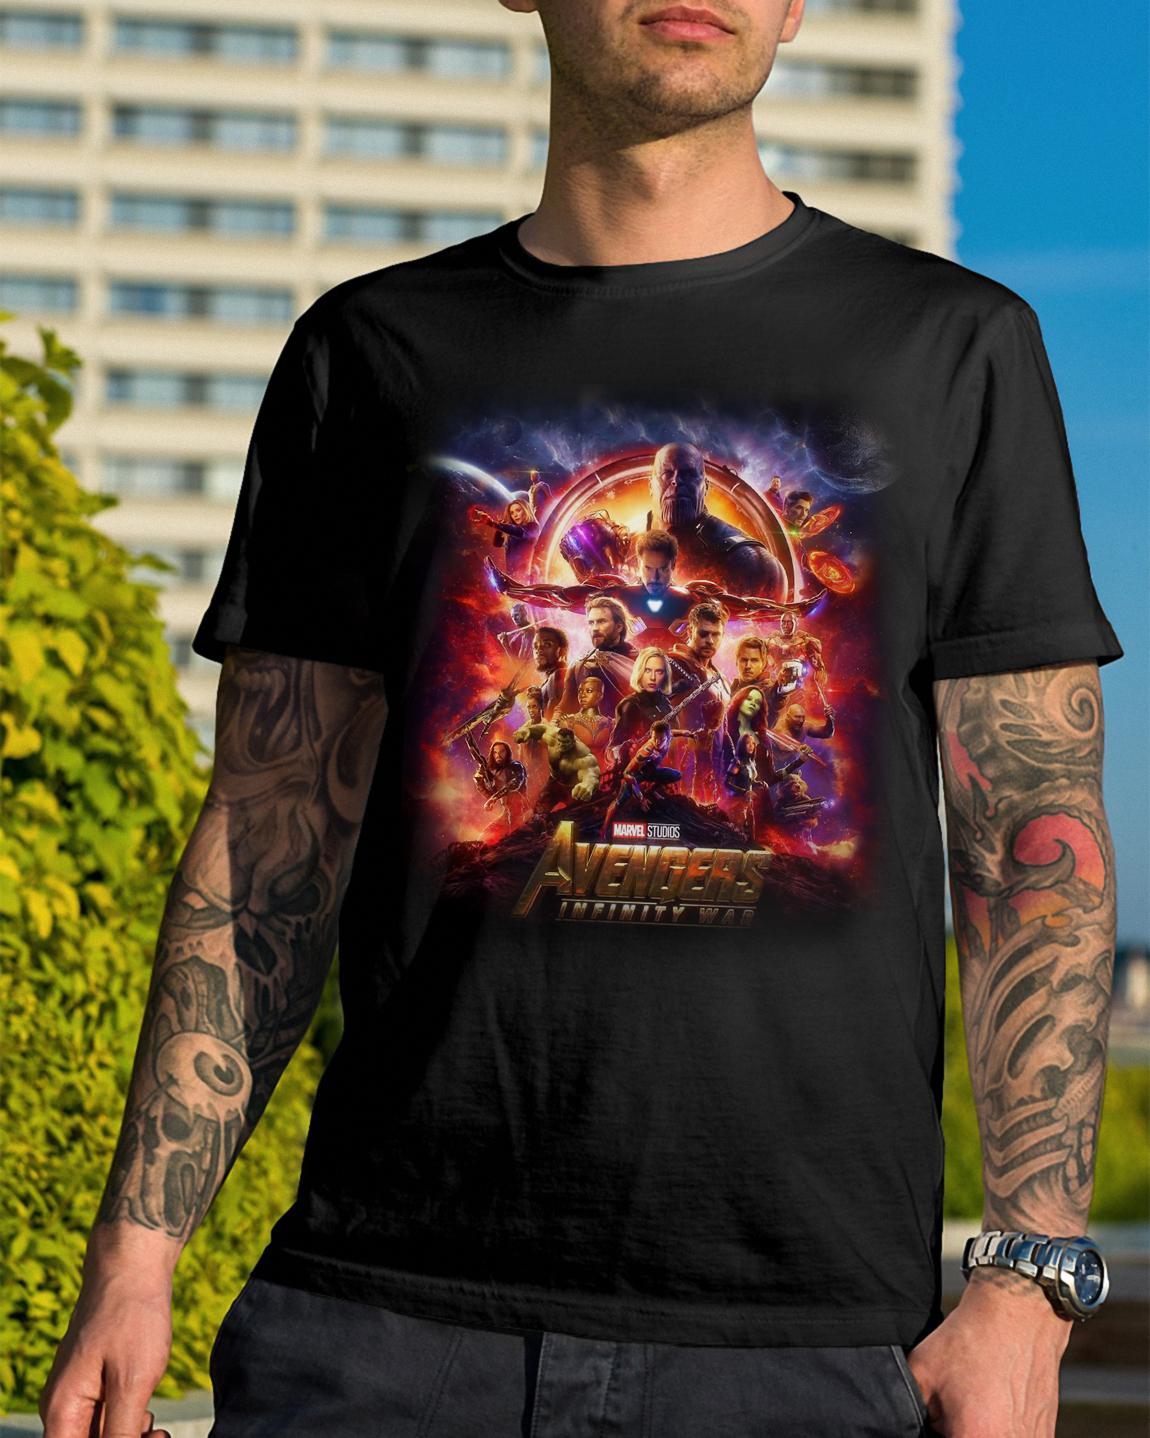 Marvel Studios Avengers Infinity War Shirt